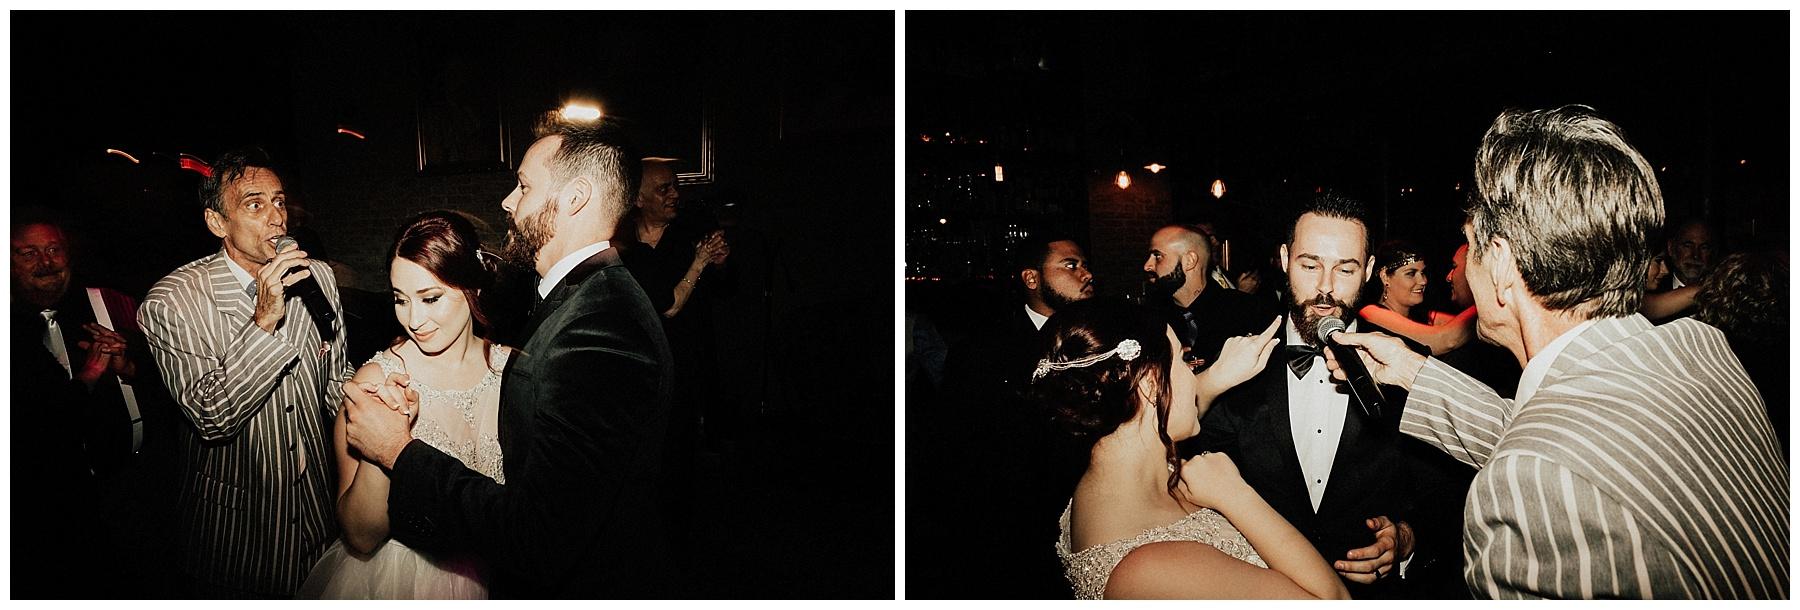 Fort Lauderdale Wedding Tampa Wedding Photographer-175.jpg